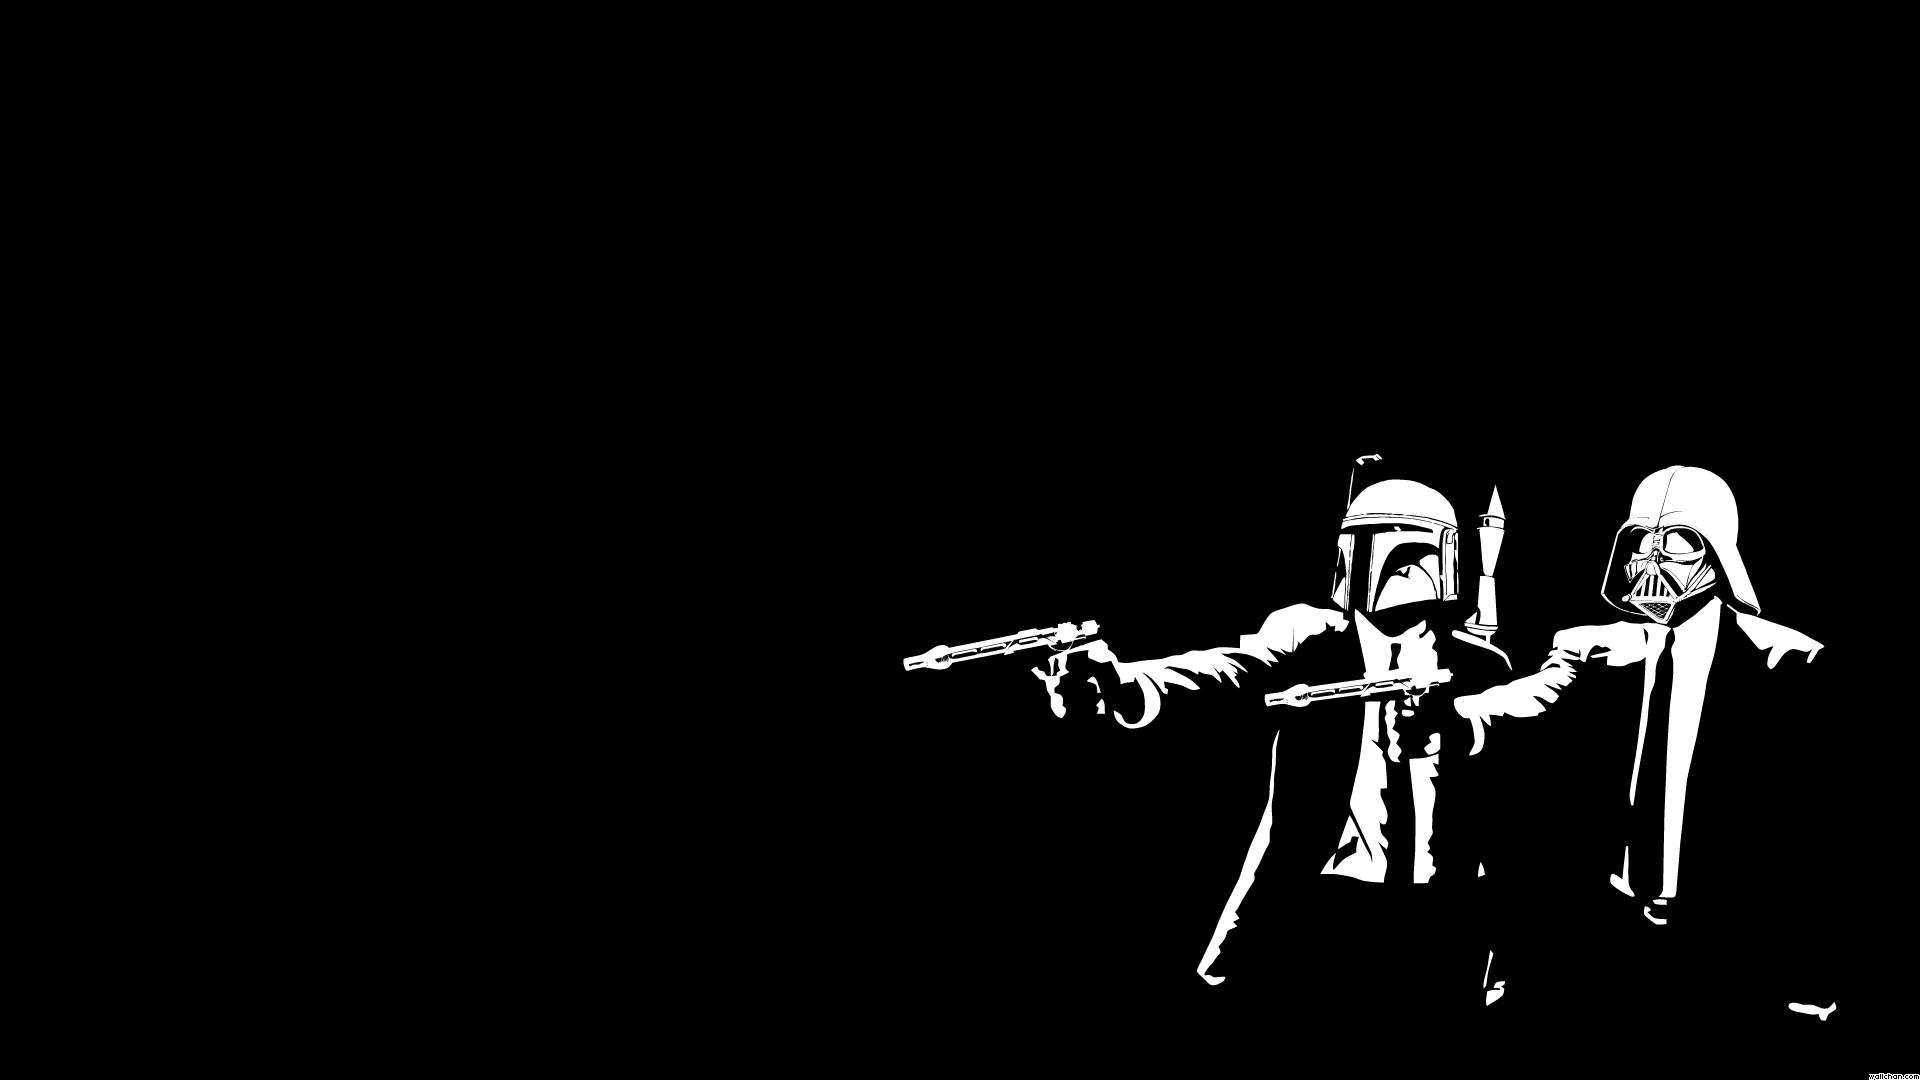 Star-Wars-Desktop-Background-Sdeer-wallpaper-wp38010482